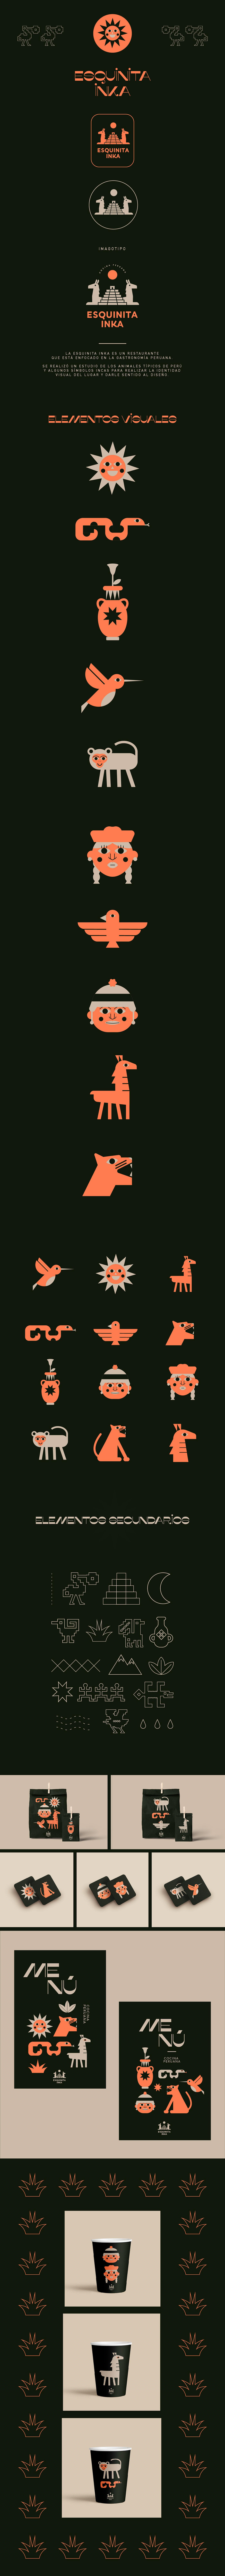 branding  design diseñografico graphicdesign ILLUSTRATION  ilustracion Packaging visualidentity